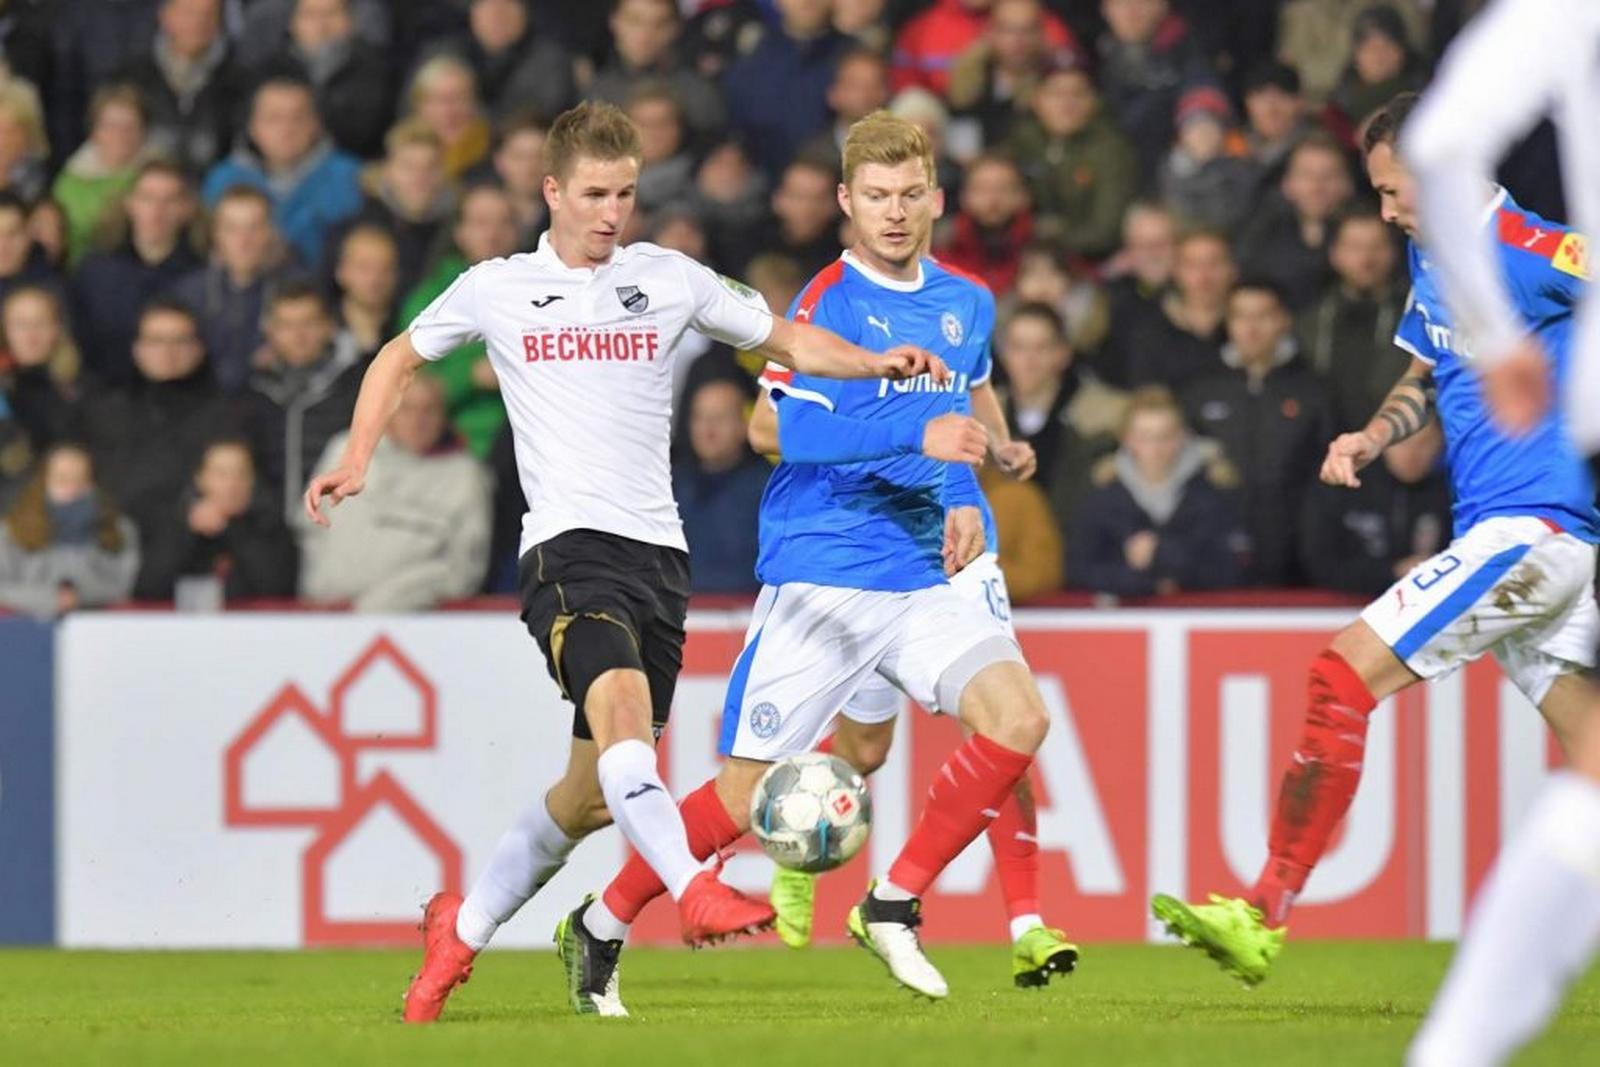 Jan Schöppner gegen Kiels Alexander Mühling.